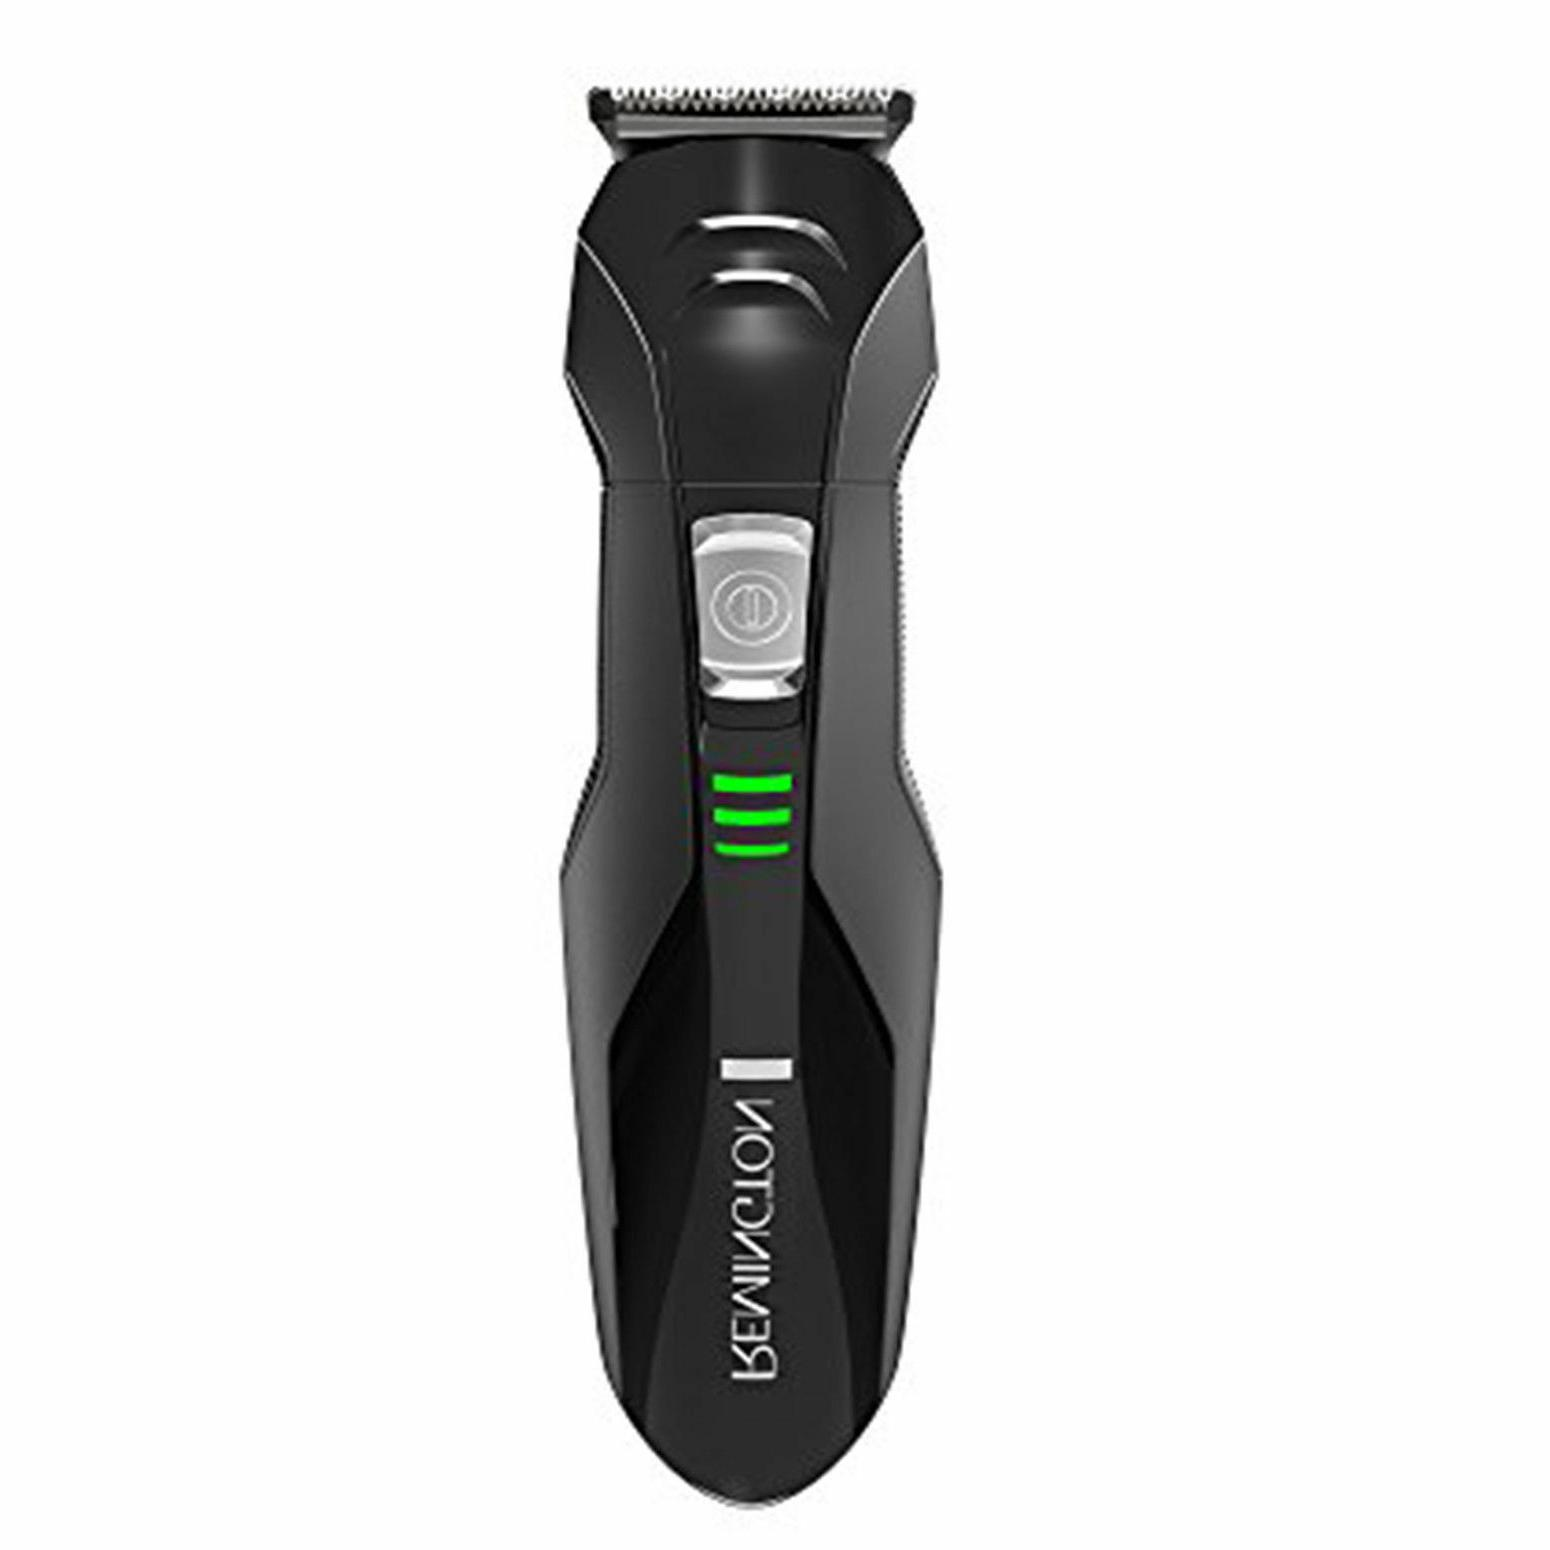 Shaving Machine Trimmer Hair Cut All-in-One Clipper Beard Mustache